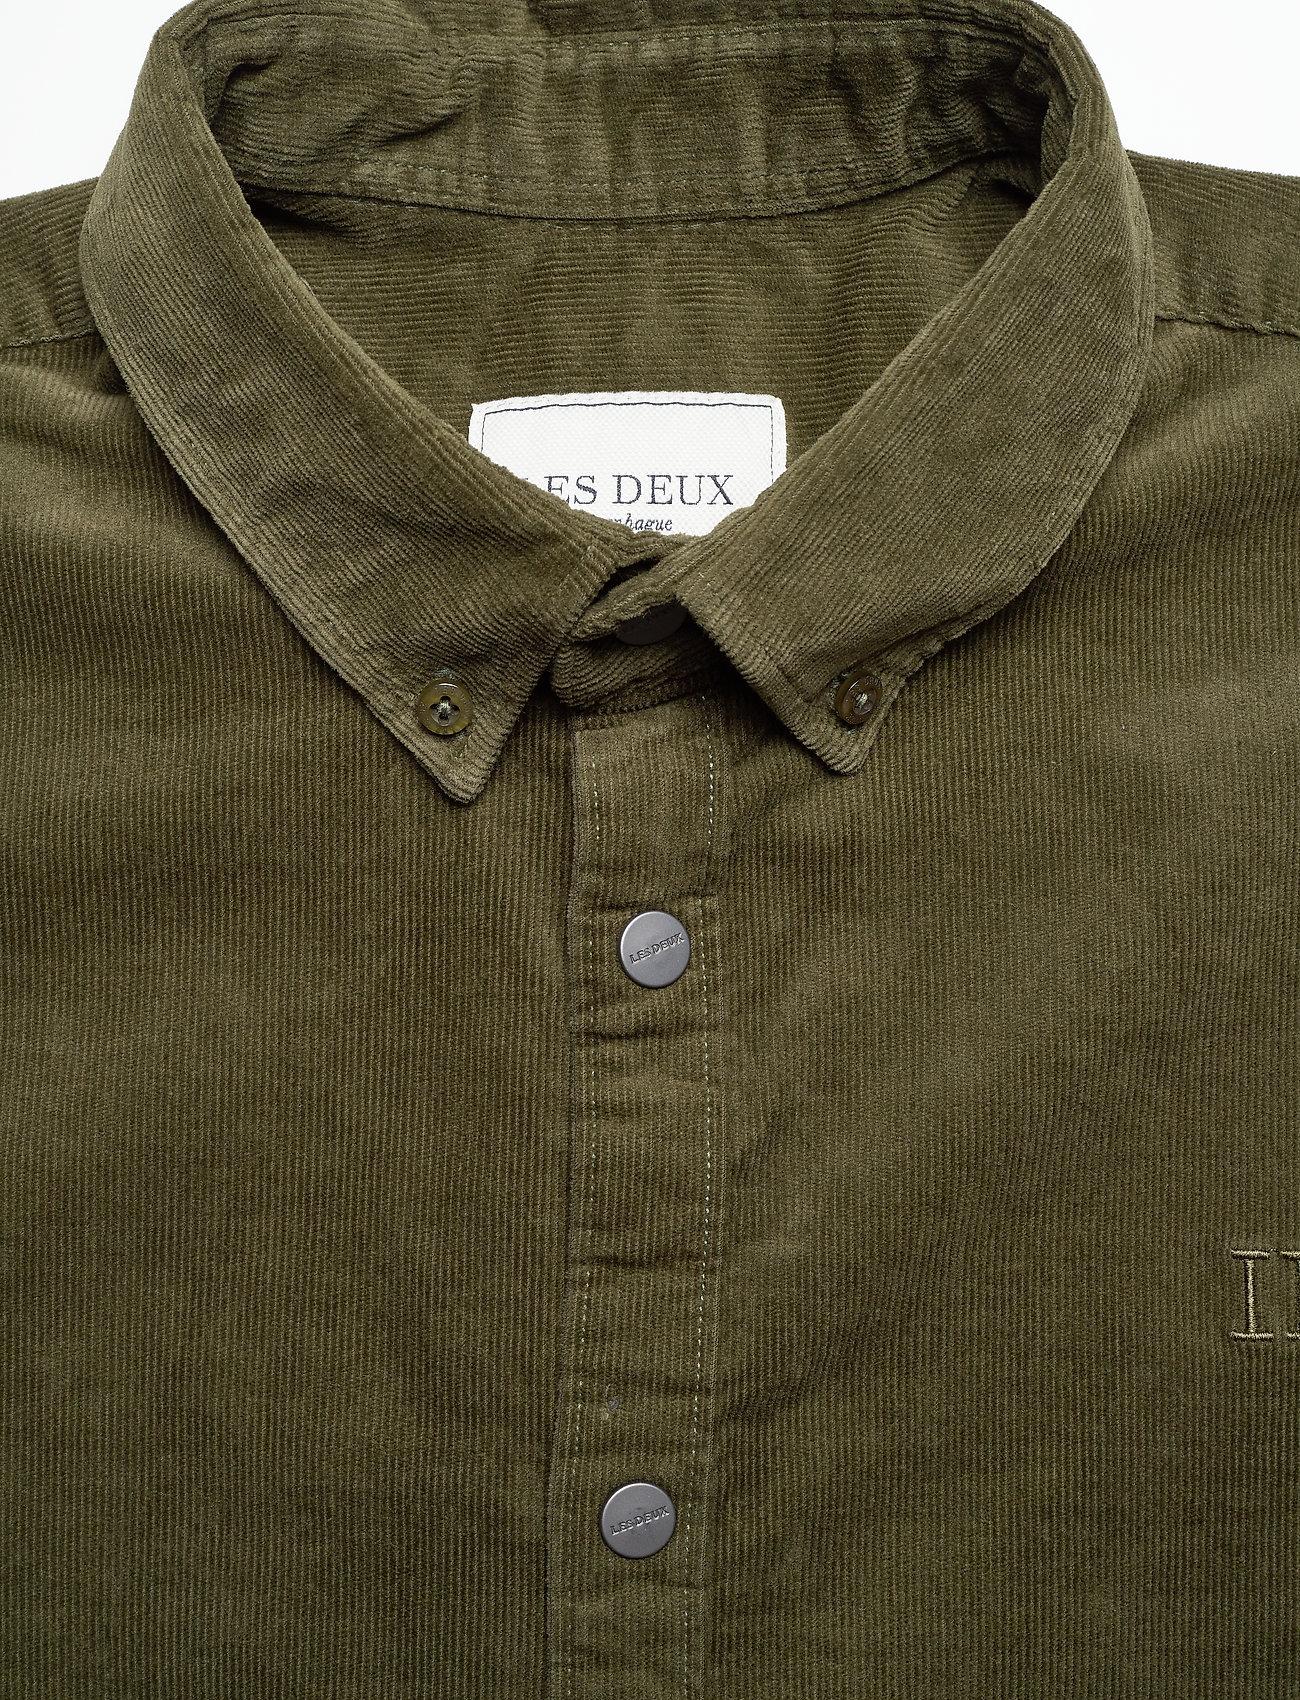 Les Deux Felix Corduroy Shirt- Chemises XFw4QZcV aoBkh dd4aNTcd